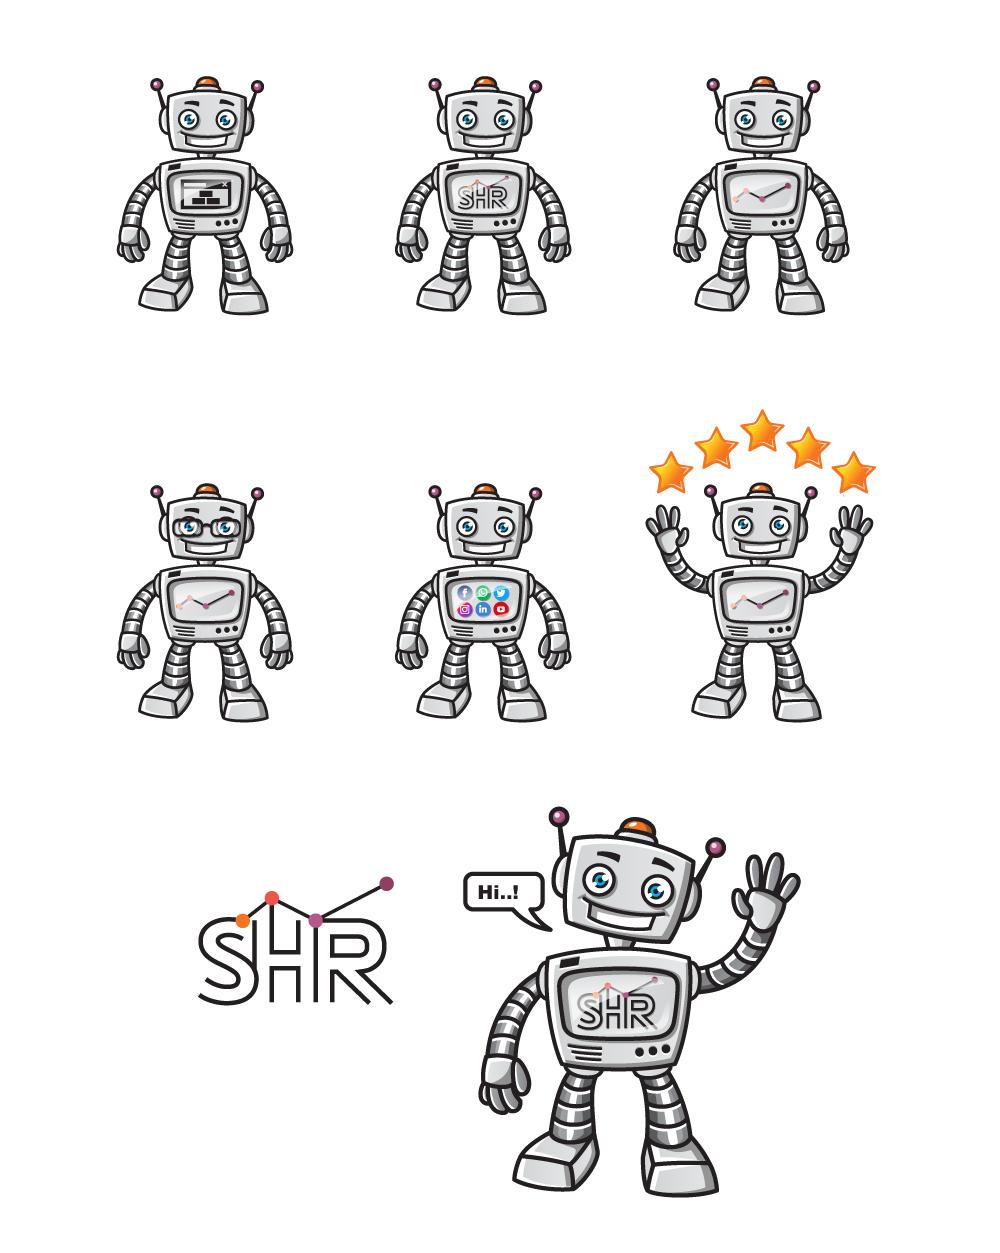 Refining & Vectorizing Robots